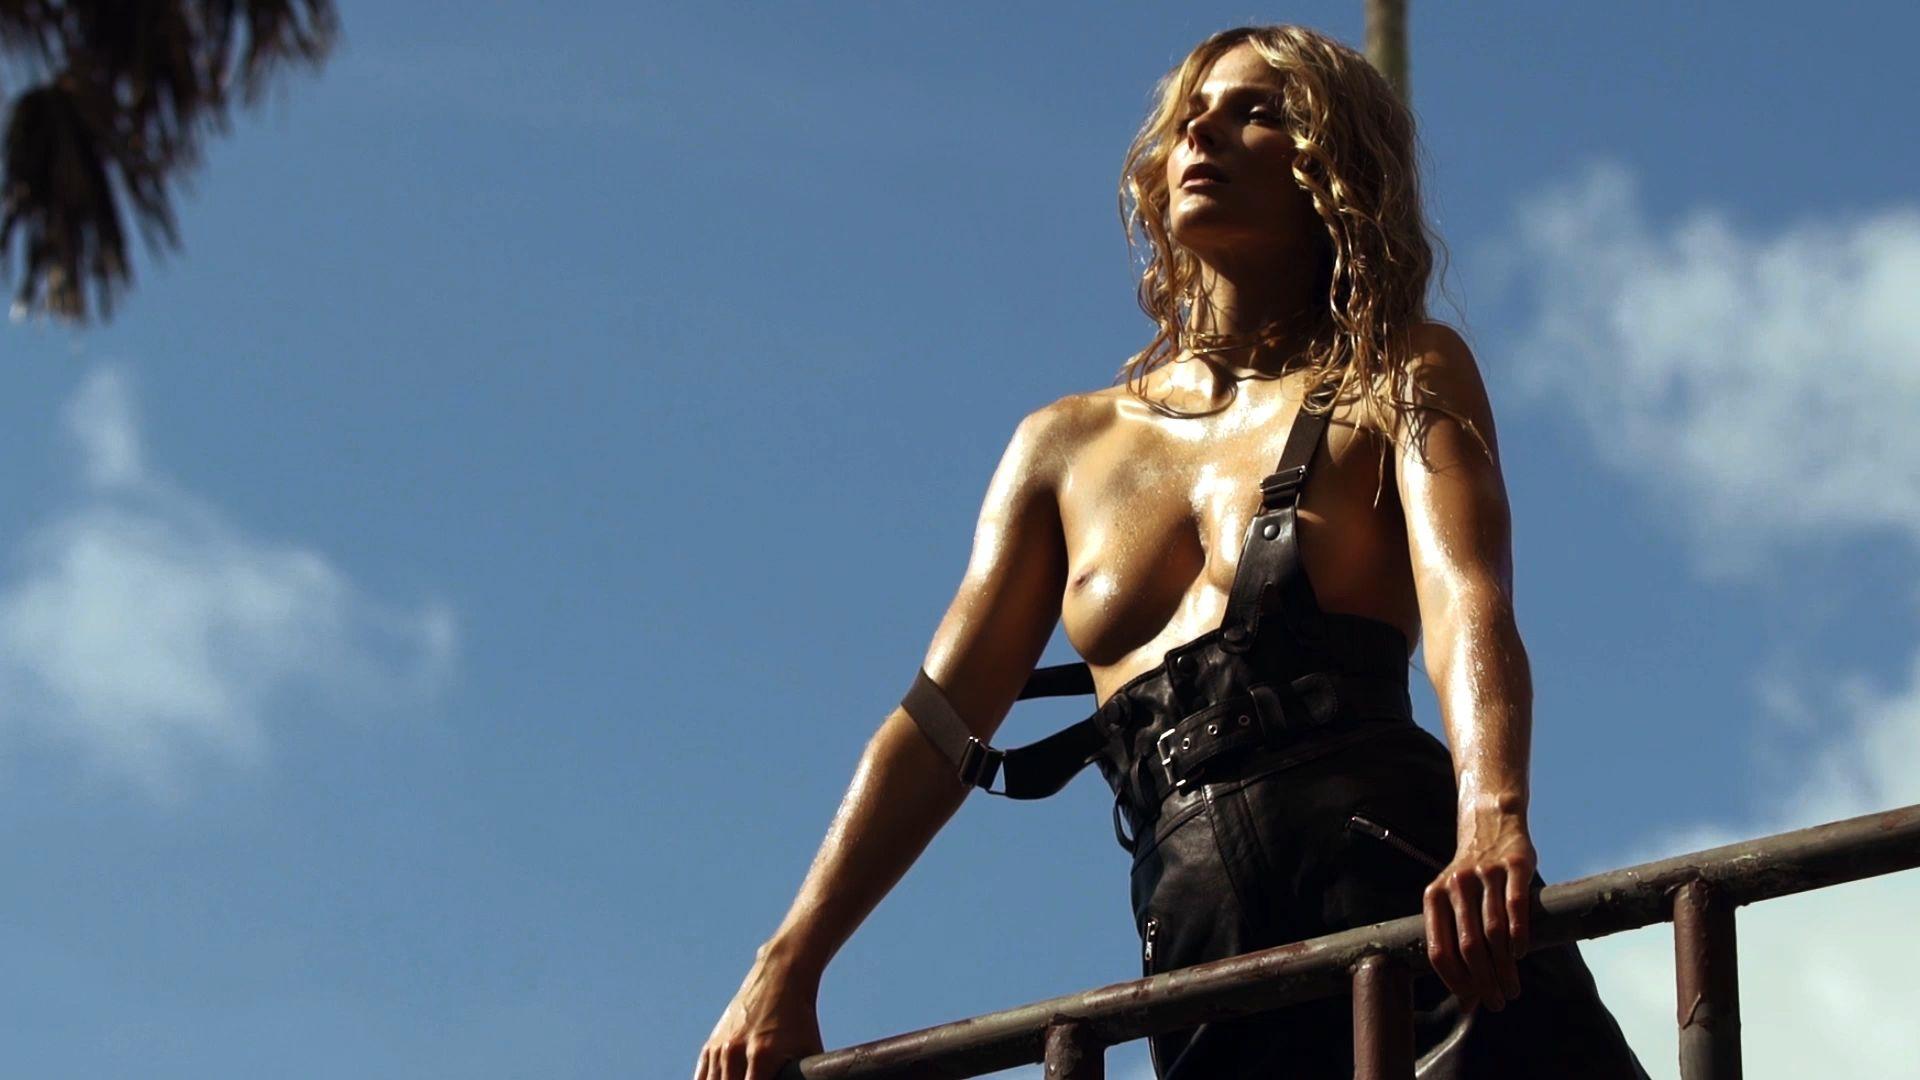 Topless Eniko Mihalik